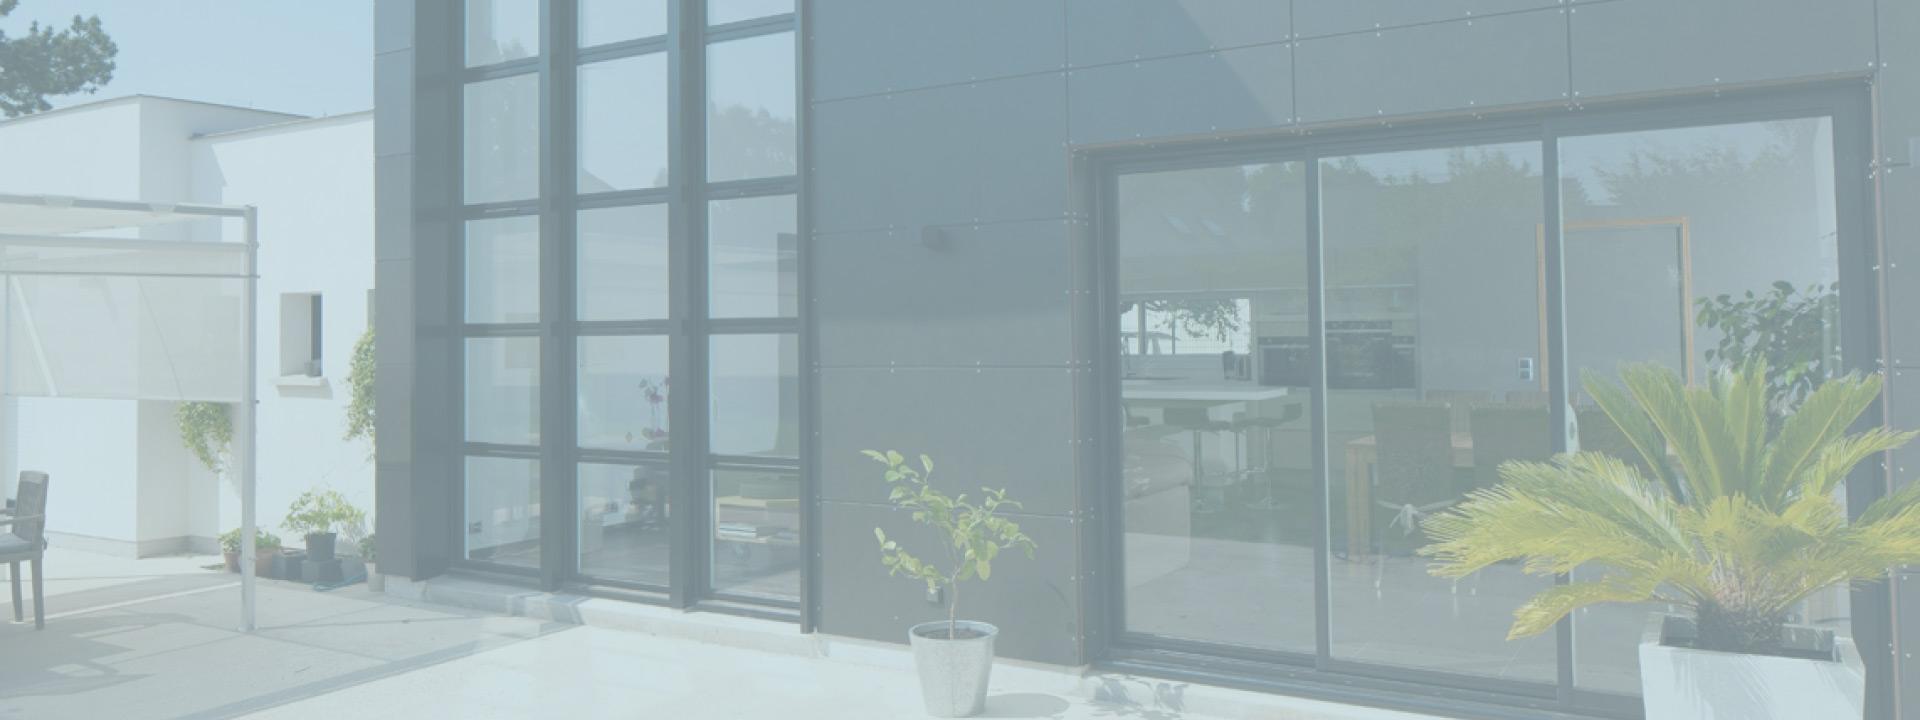 Menuiserie aluminium toulouse espace stores for Menuiserie aluminium fenetre